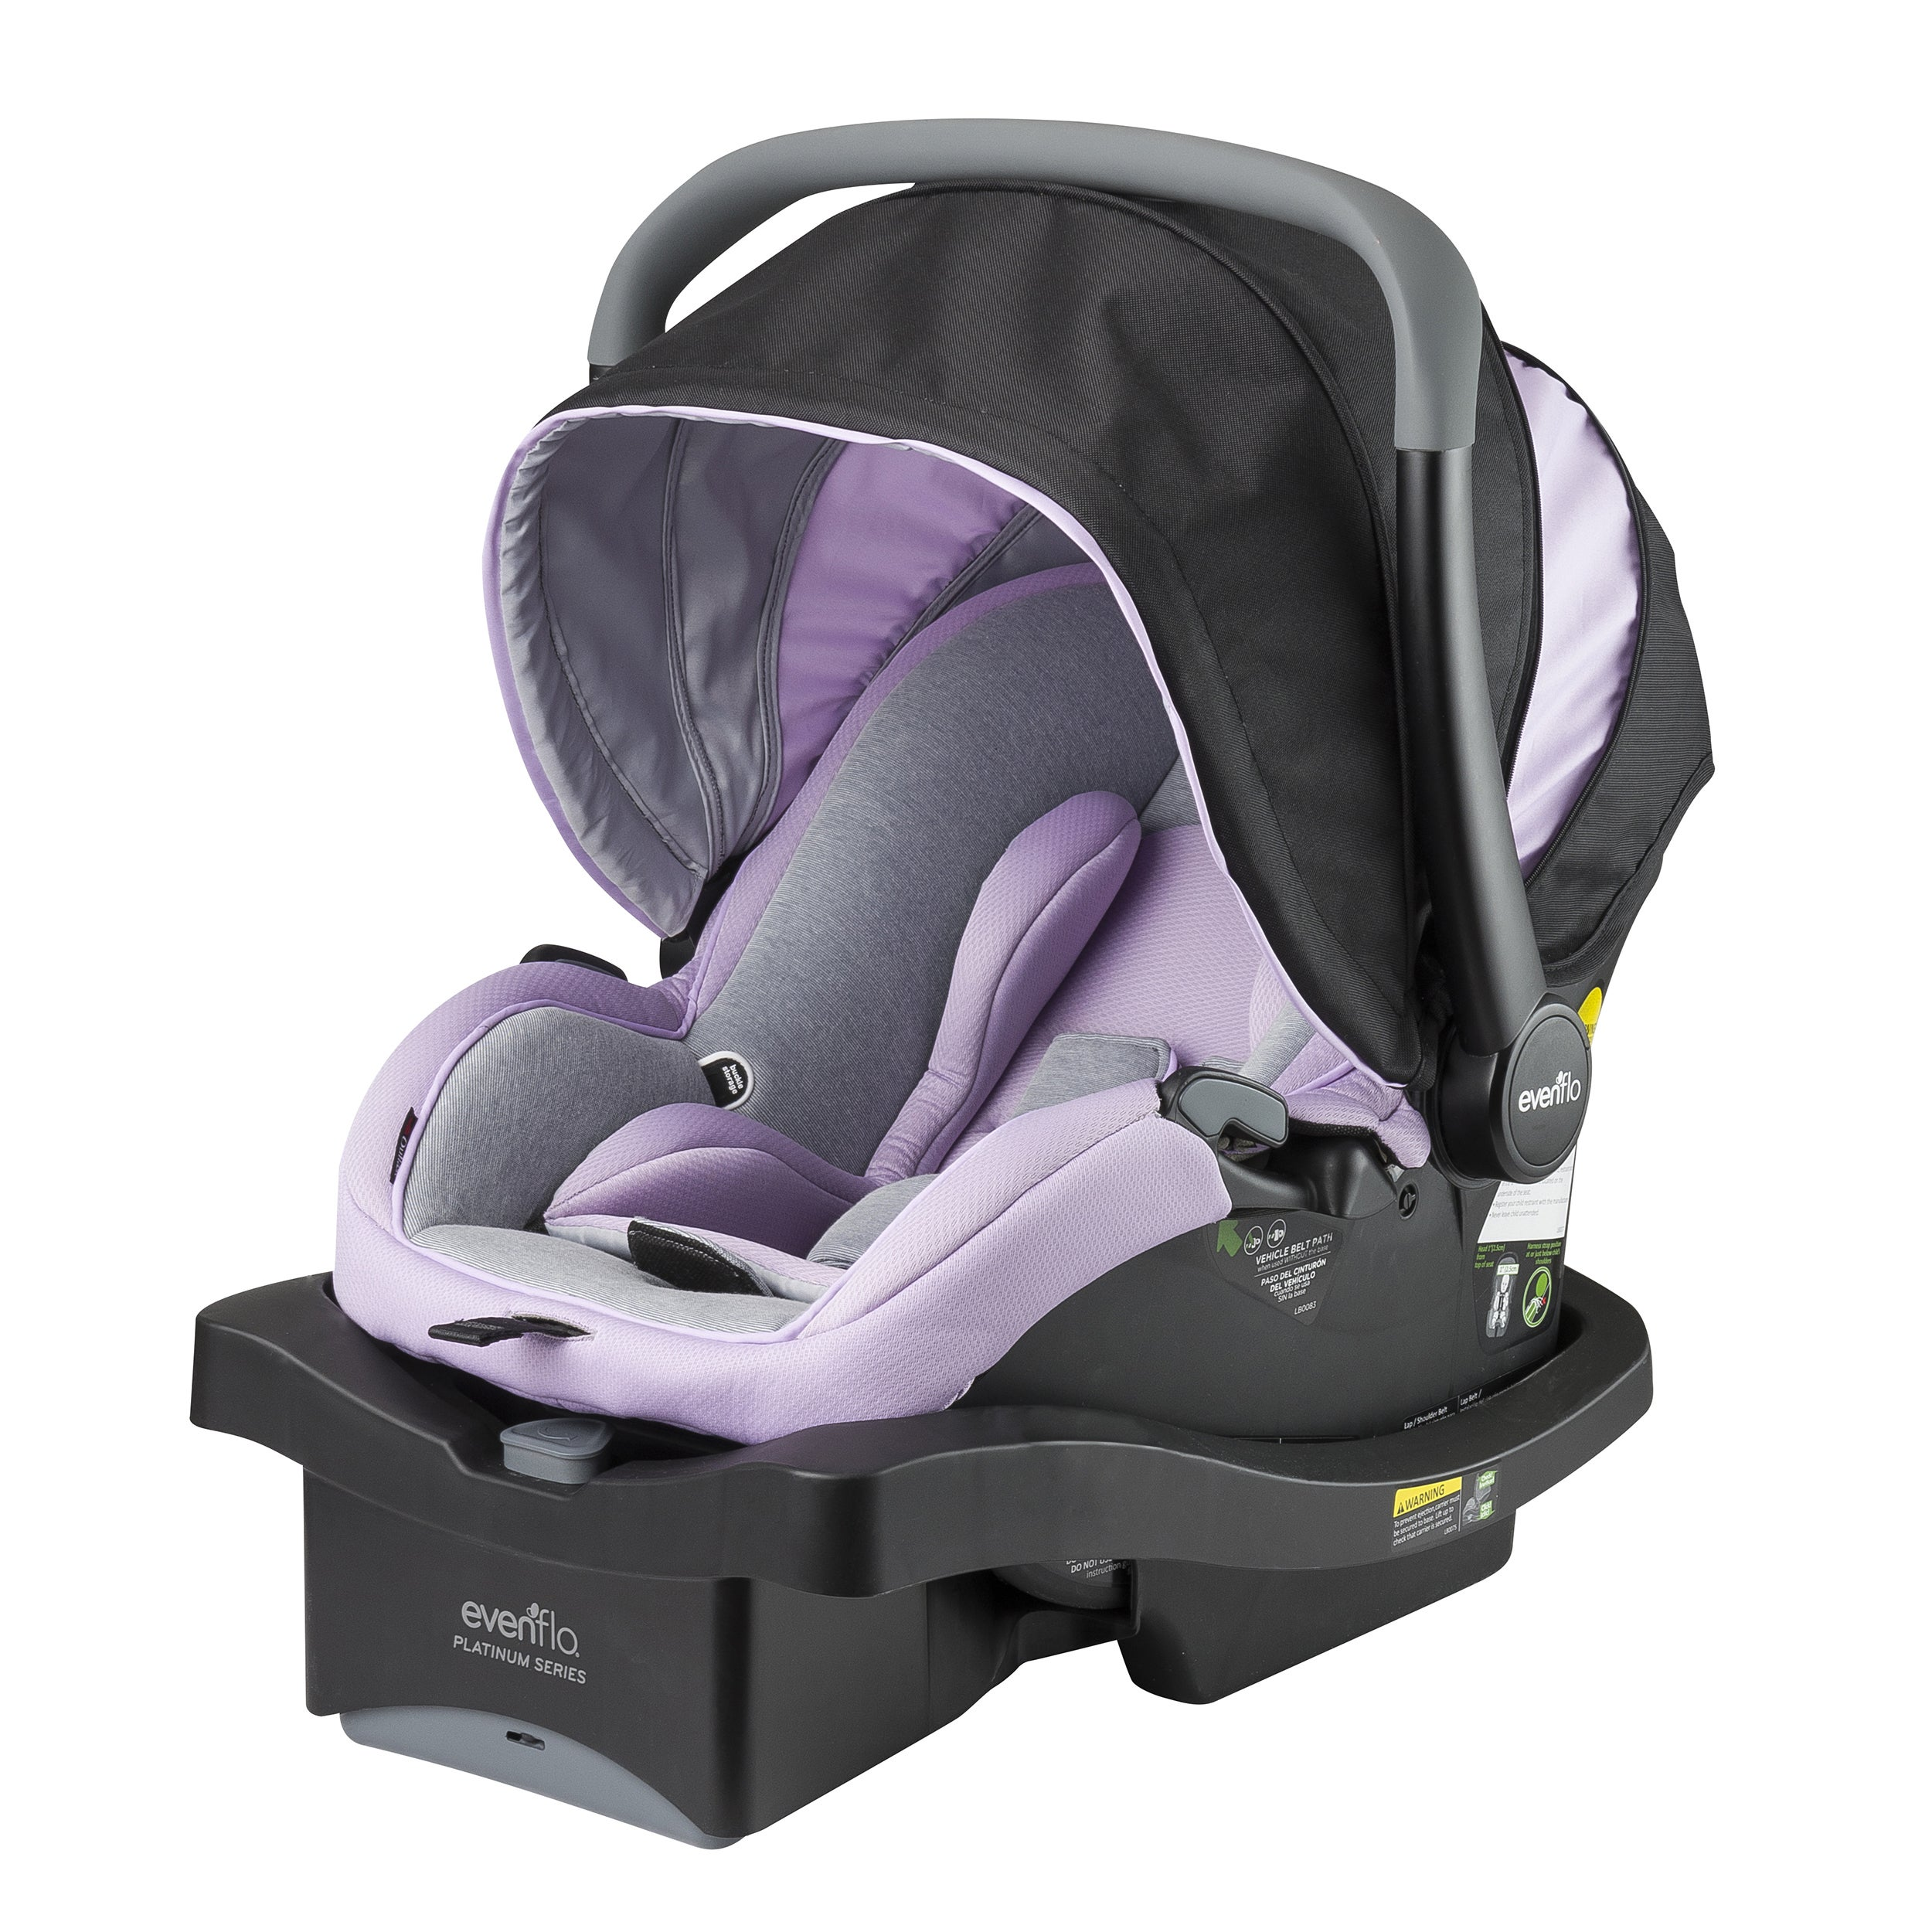 Evenflo Platinum LiteMax 35 Infant Car Seat (Aurora), Grey